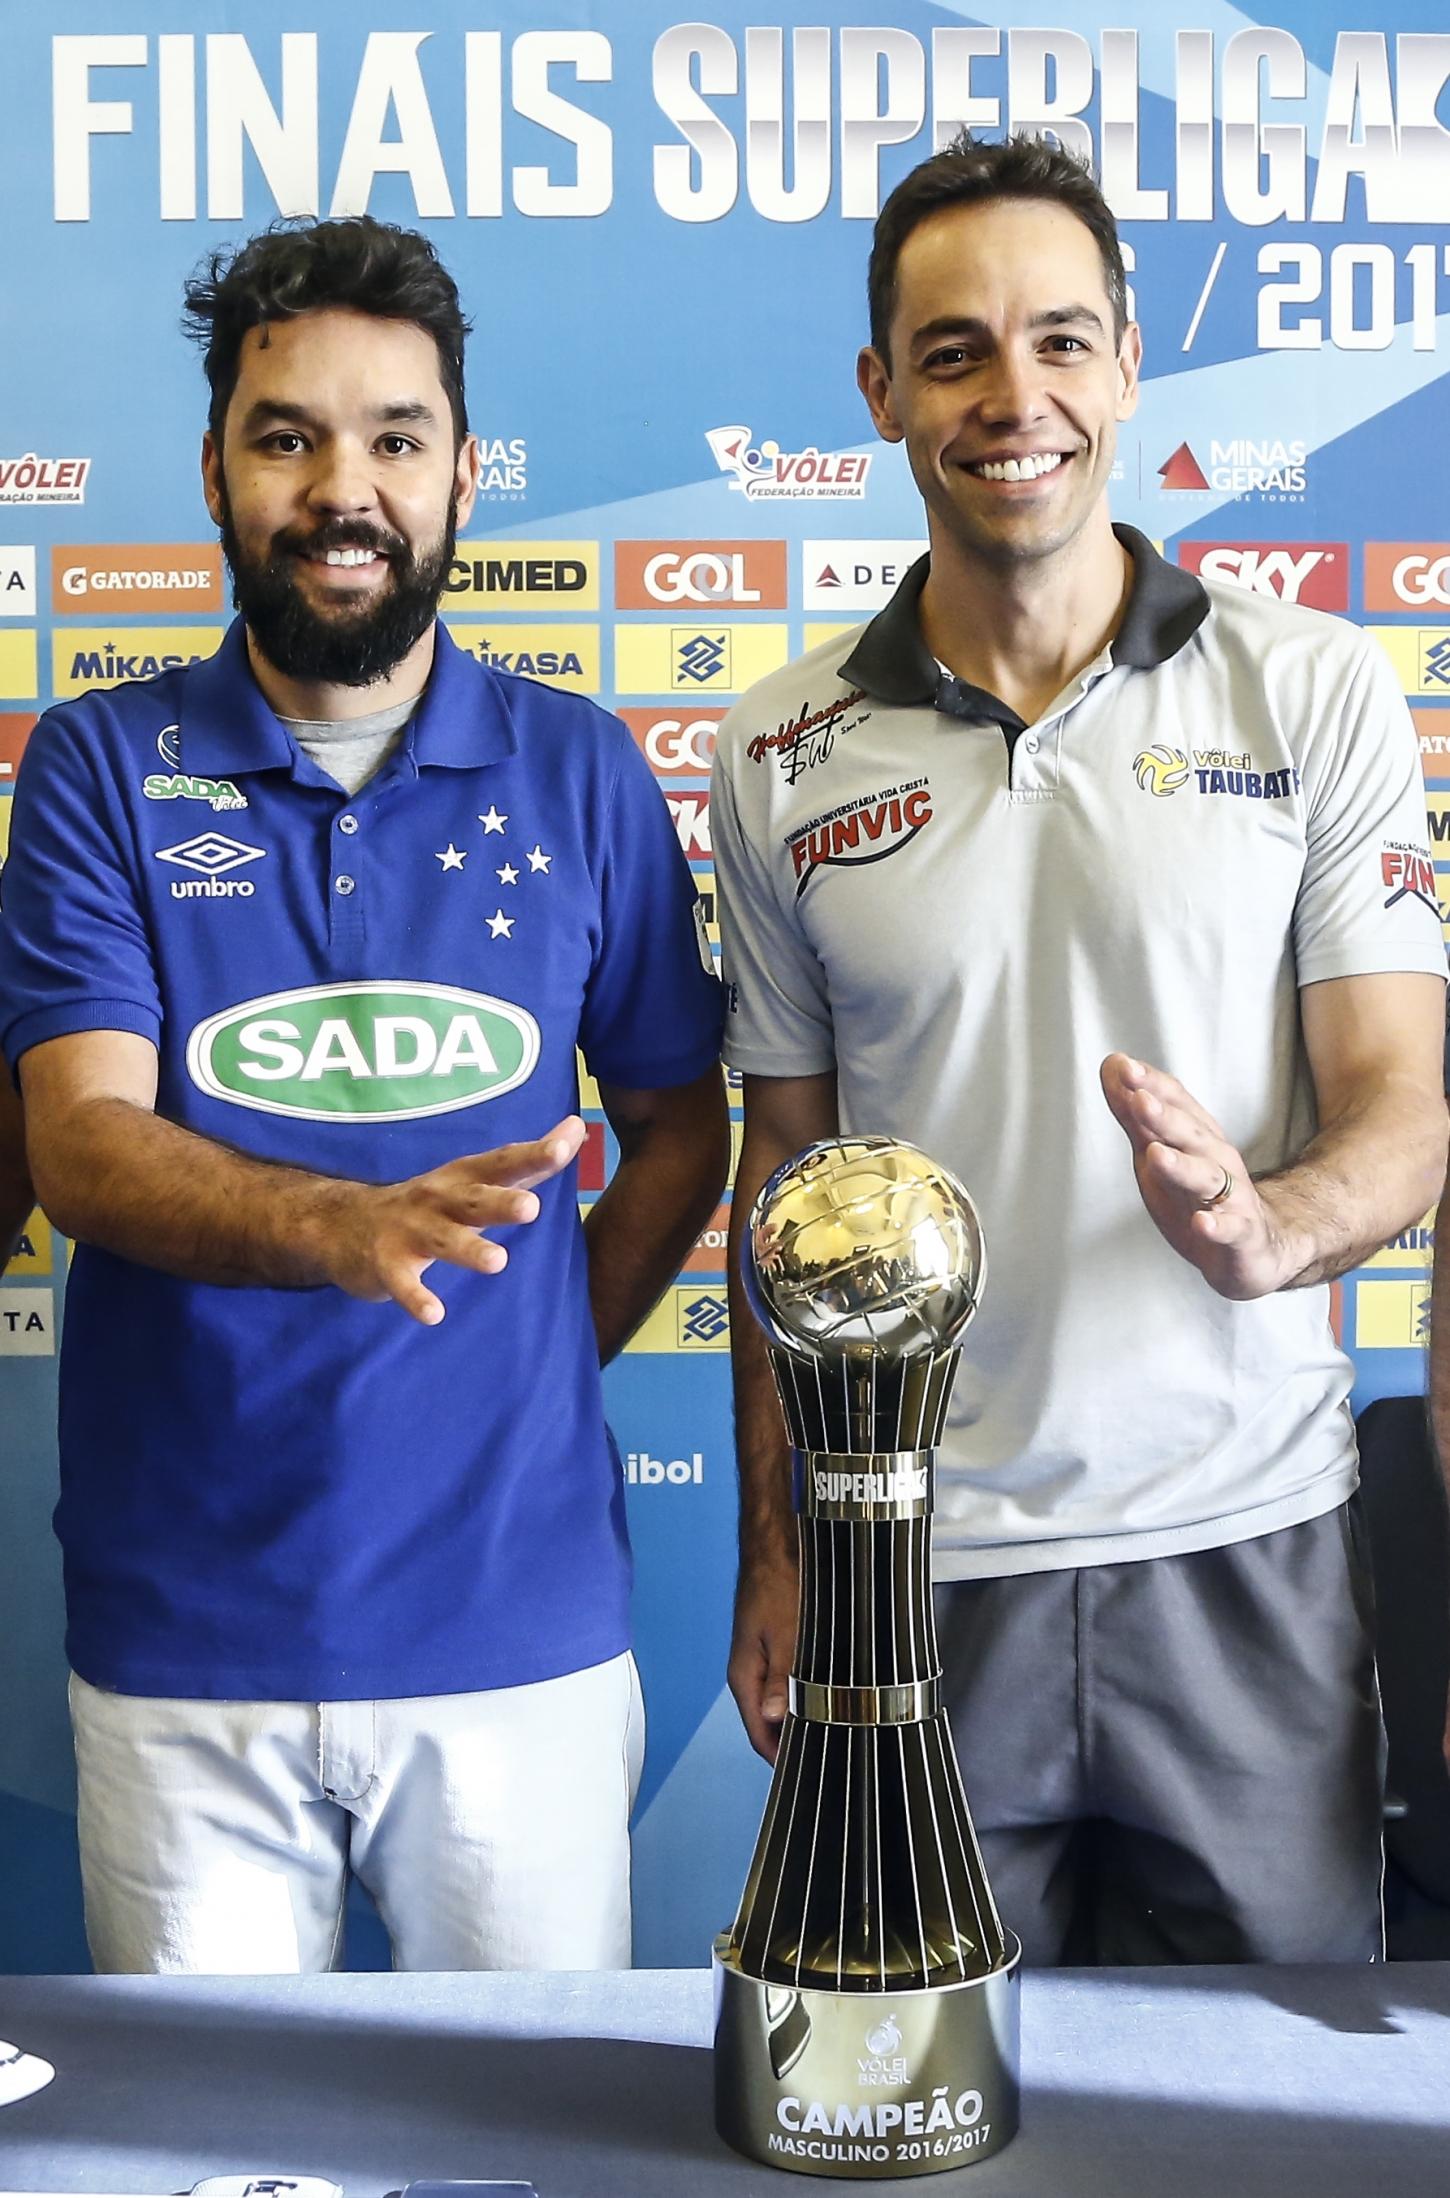 Belo Horizonte (MG) - 04.05.2017 - Coletiva Final Superliga Masculina 16/17